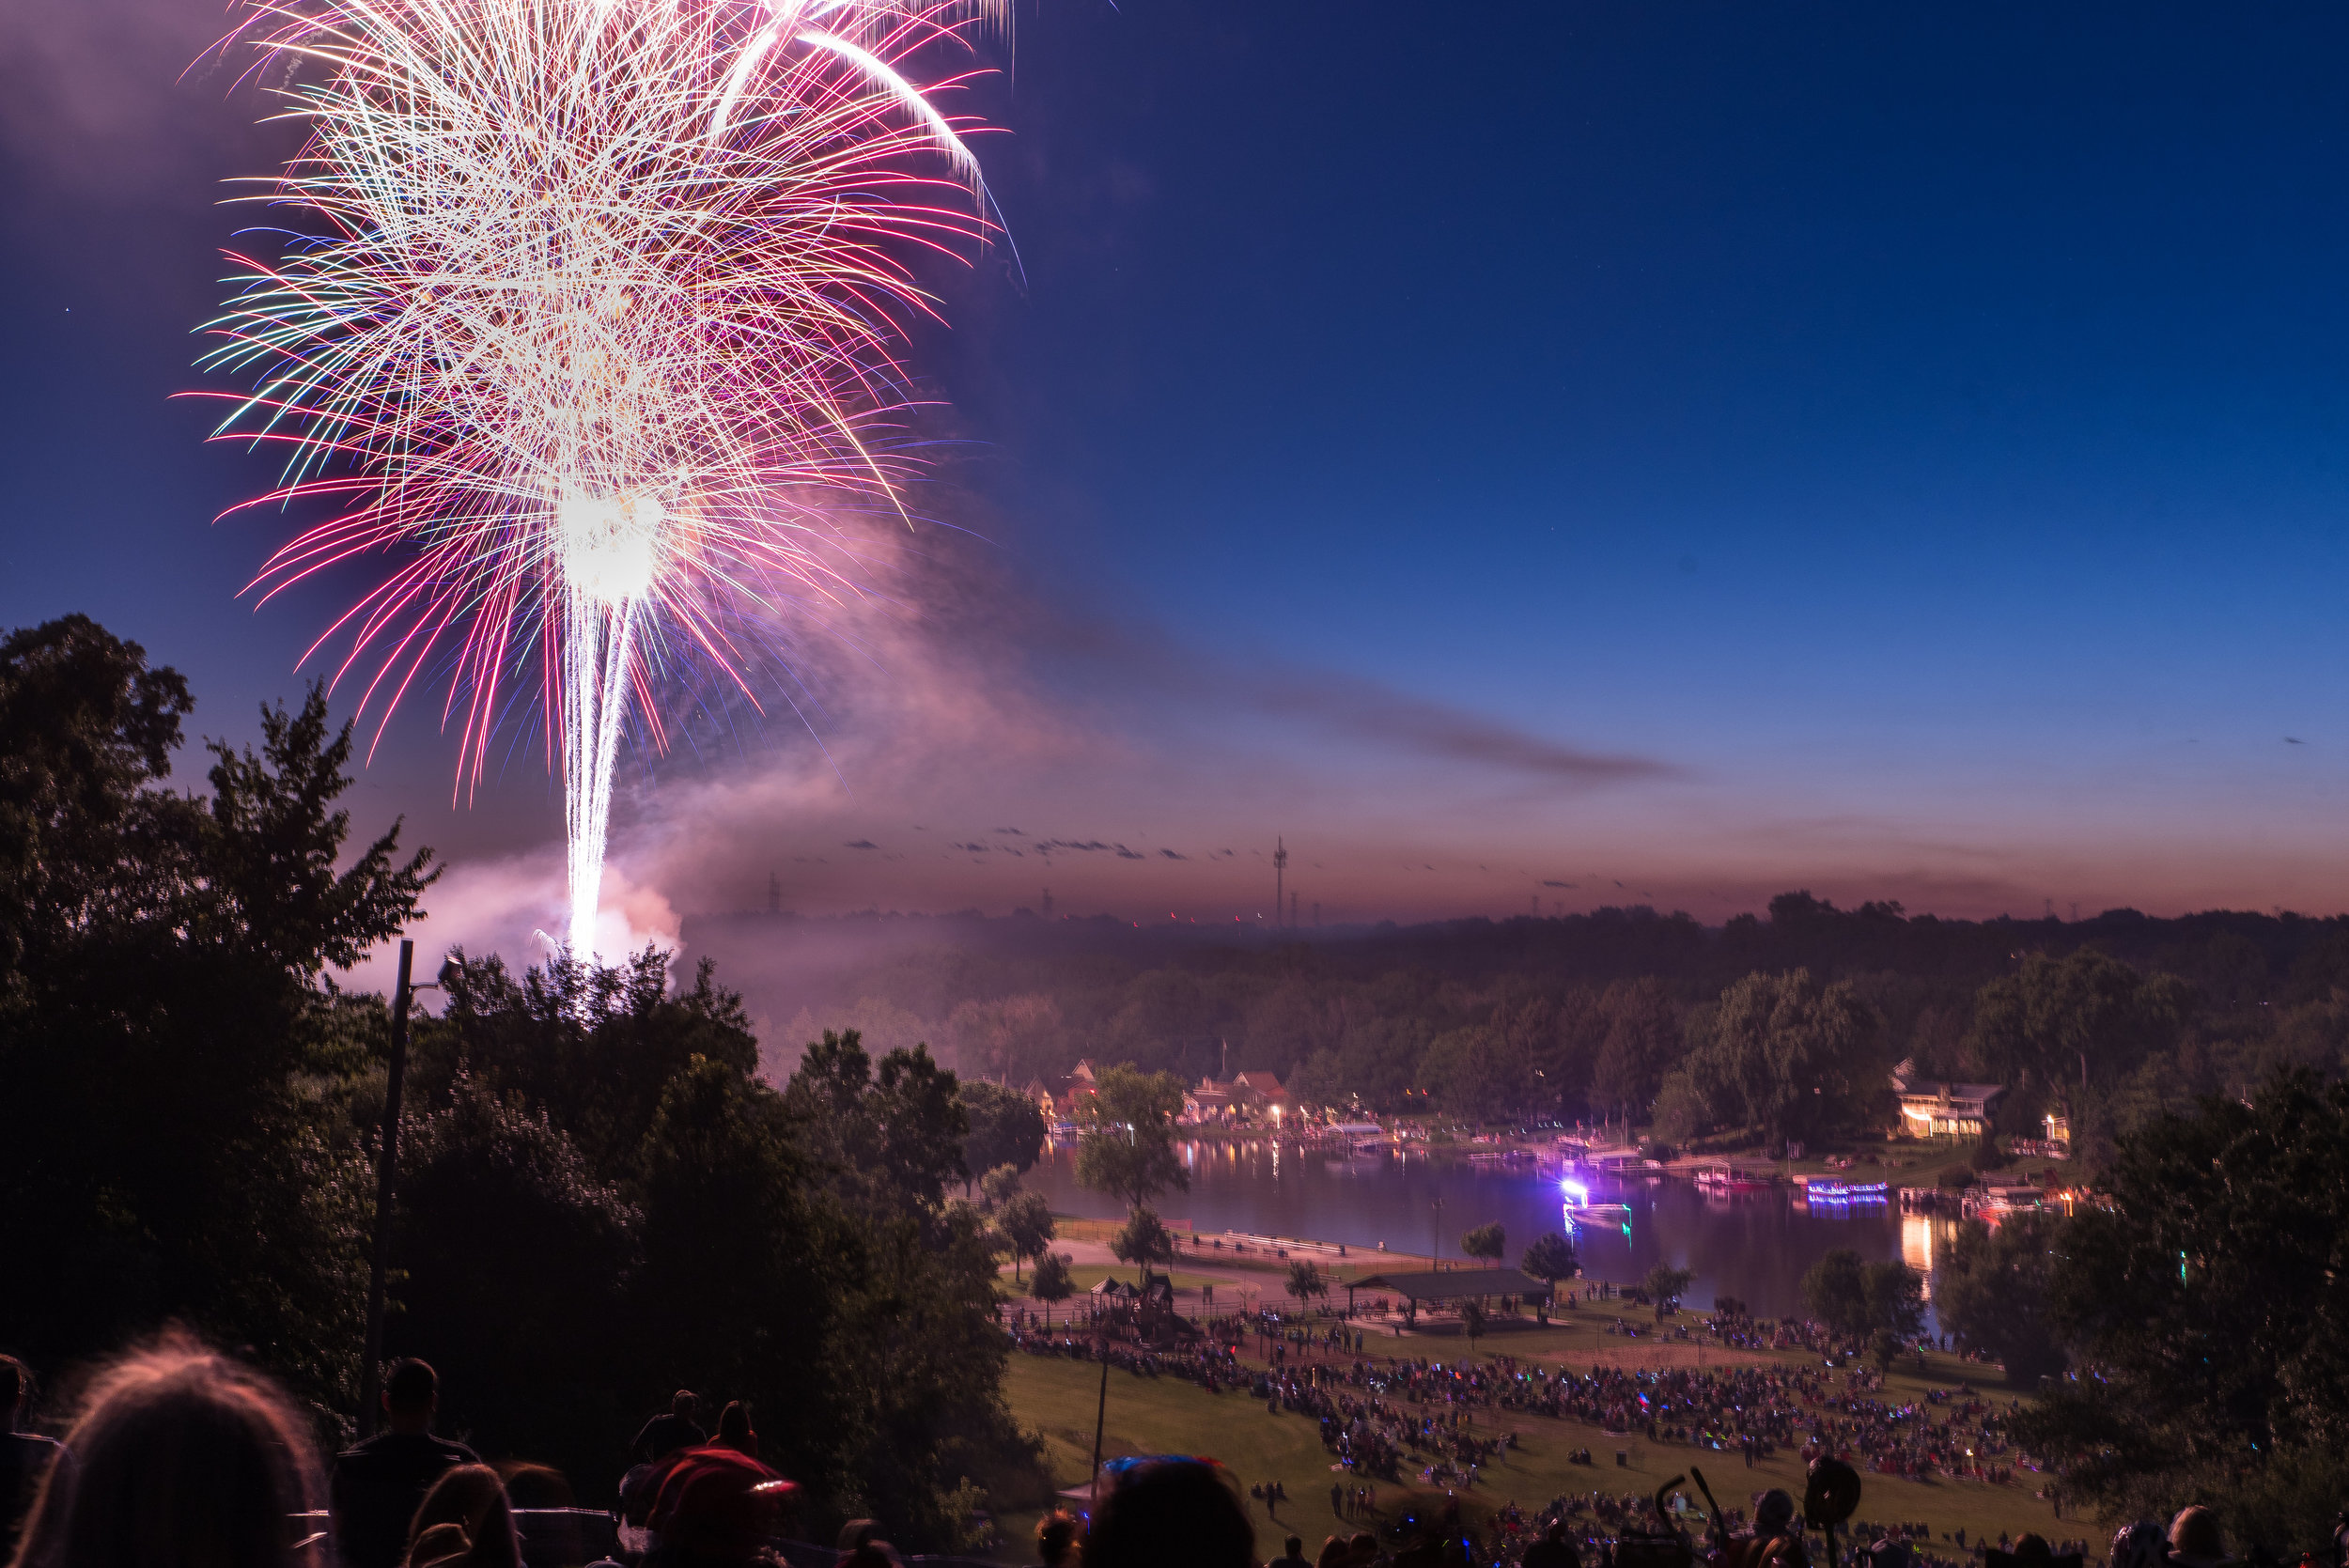 Fox_River_Grove_Fireworks_2017